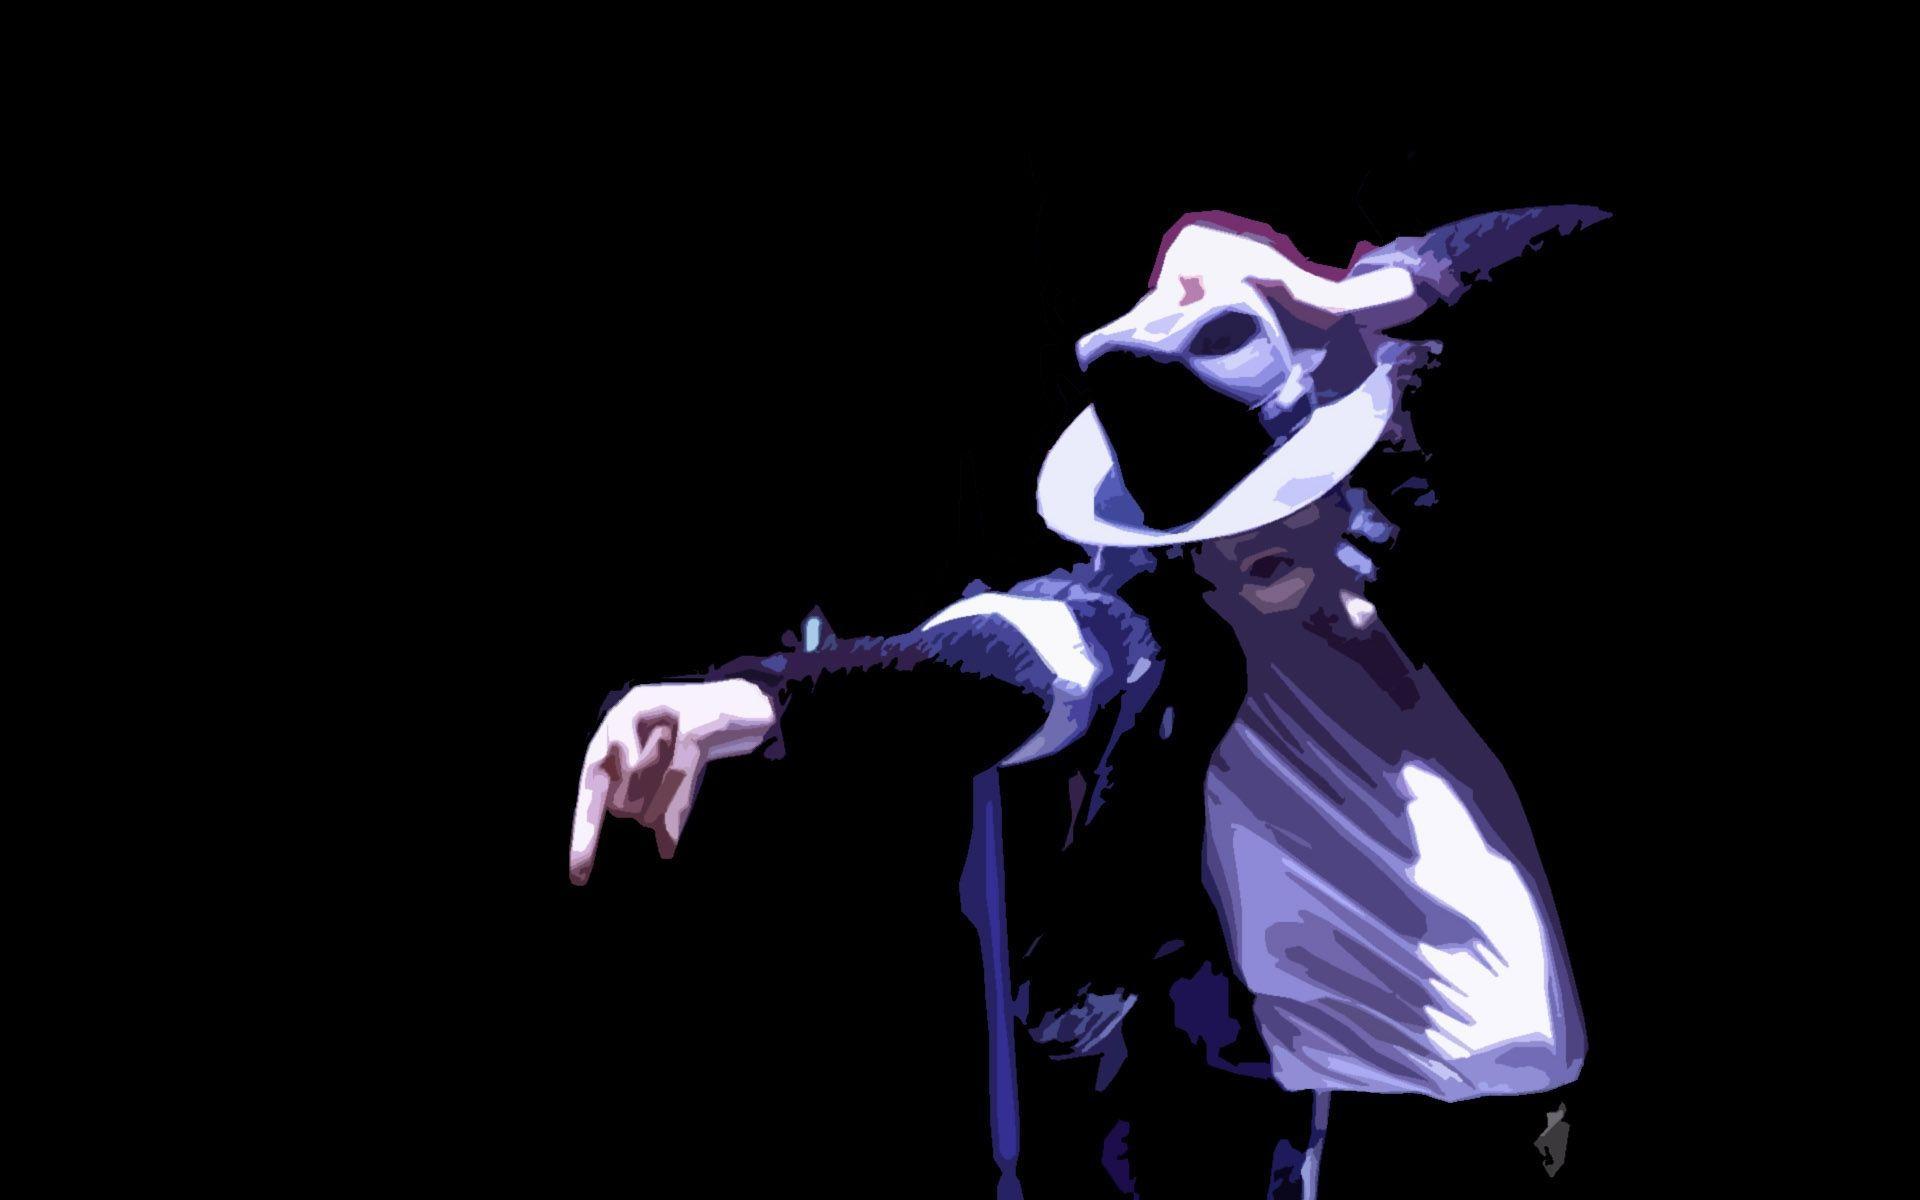 Michael Jackson wallpaper - 935586